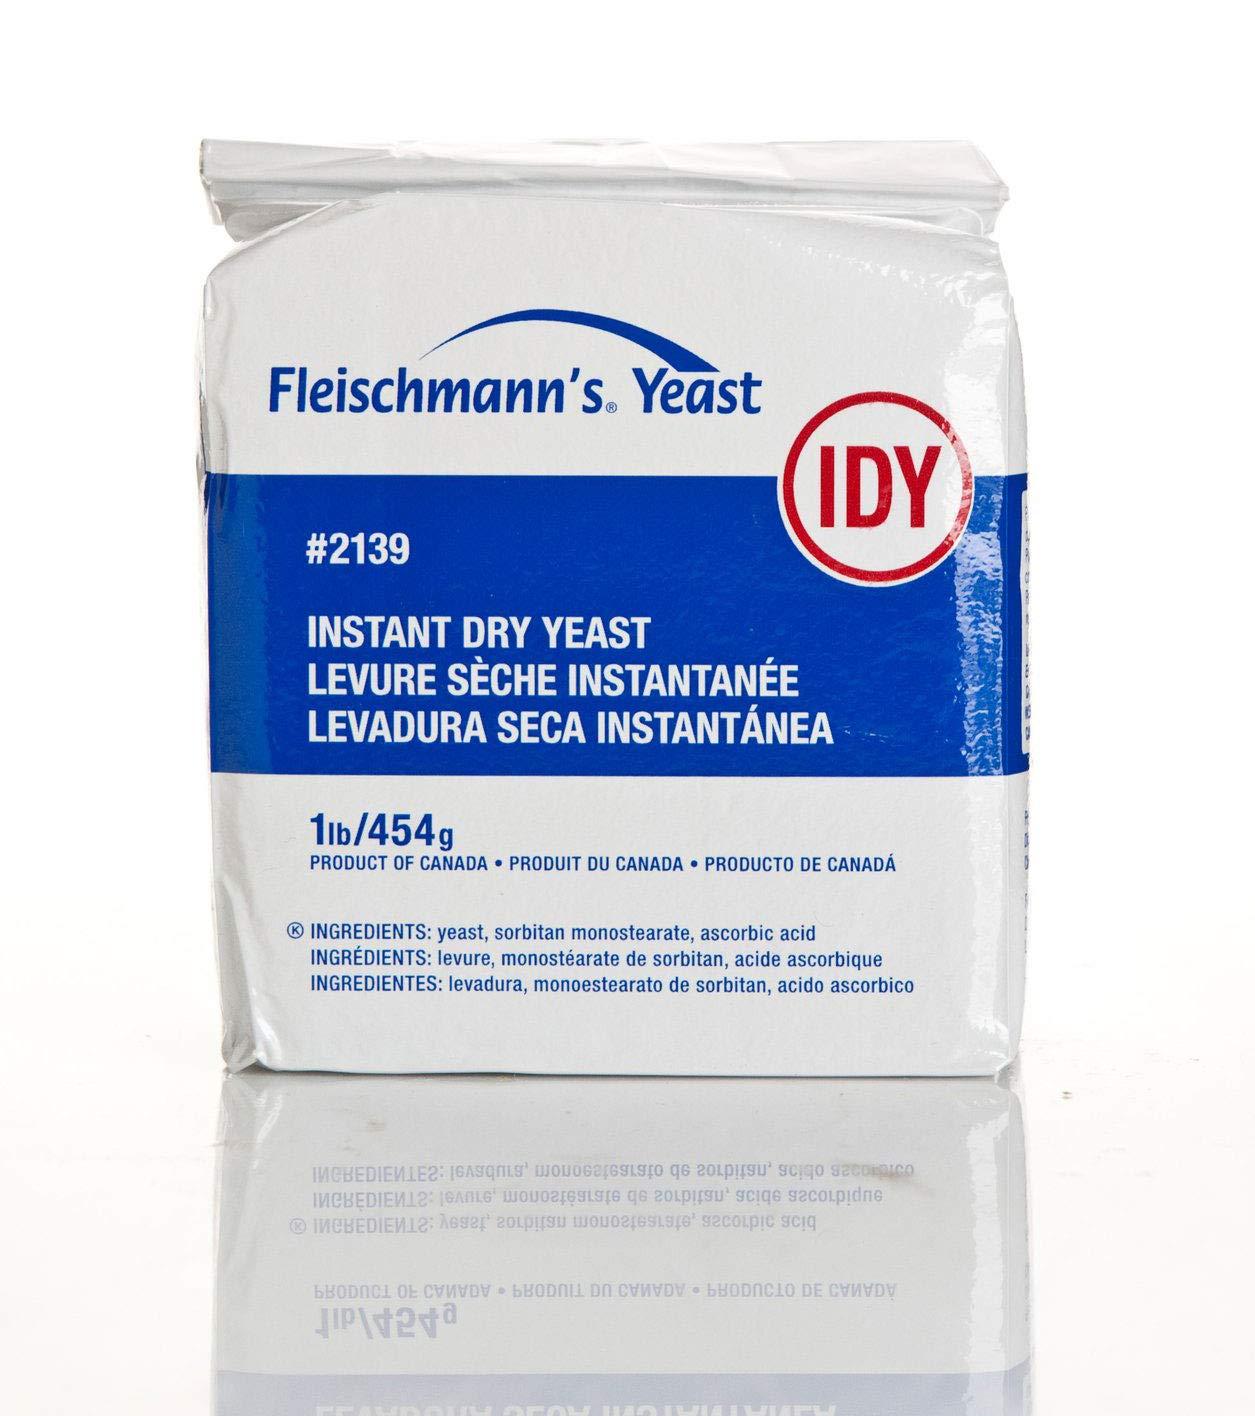 Fleischmann's Instant Dry Yeast Vacuum Pack (1 Lb)